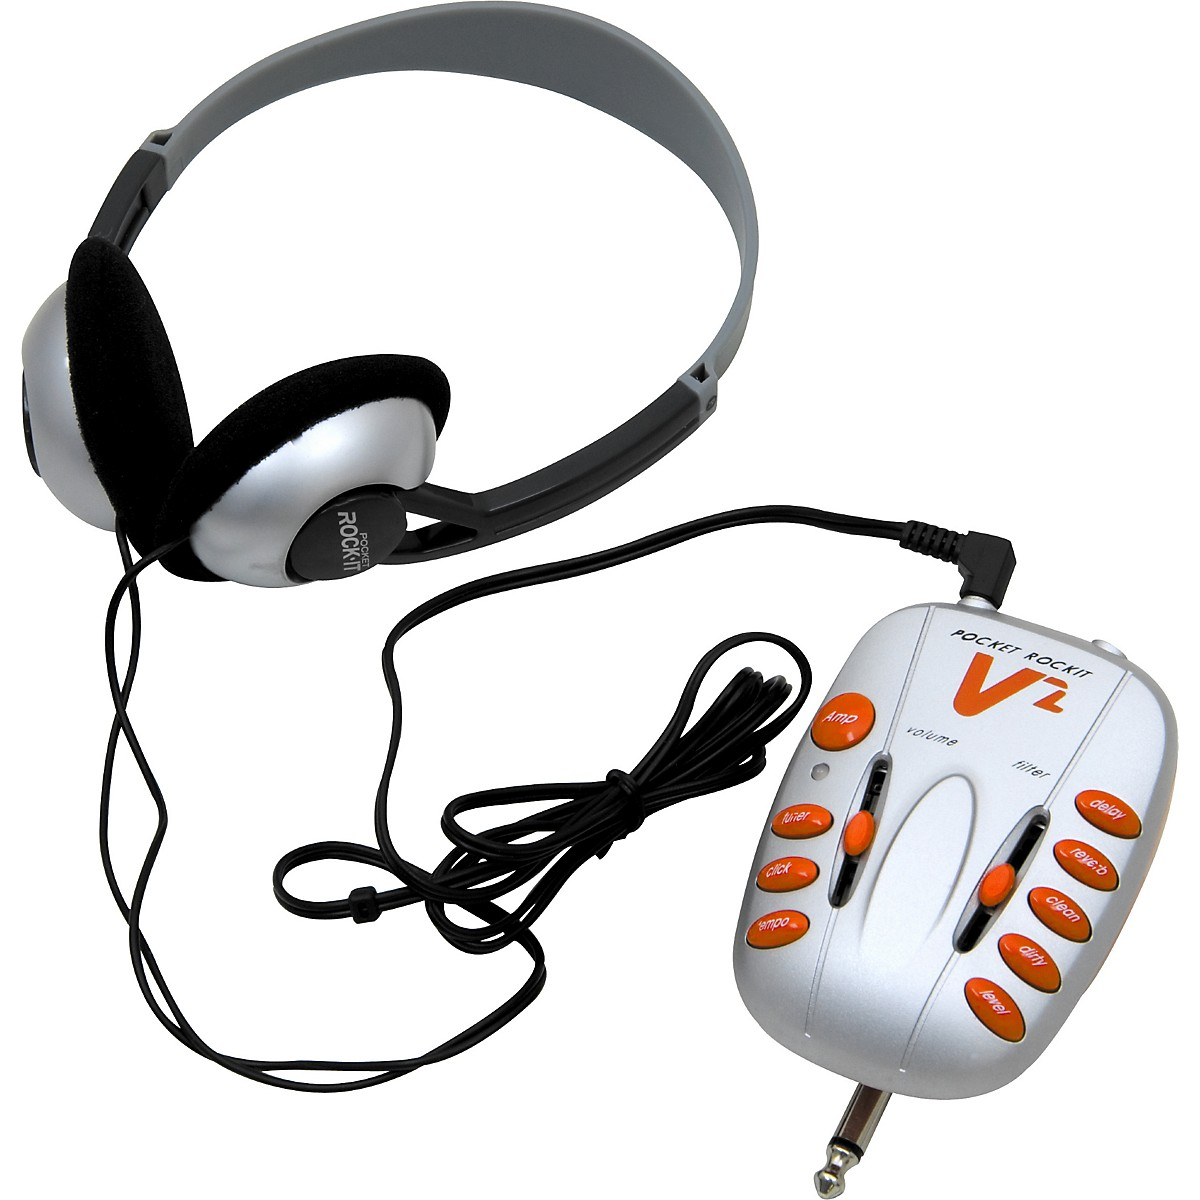 C Tech Pocket Rockit V2 Guitar Headphone Amplifier